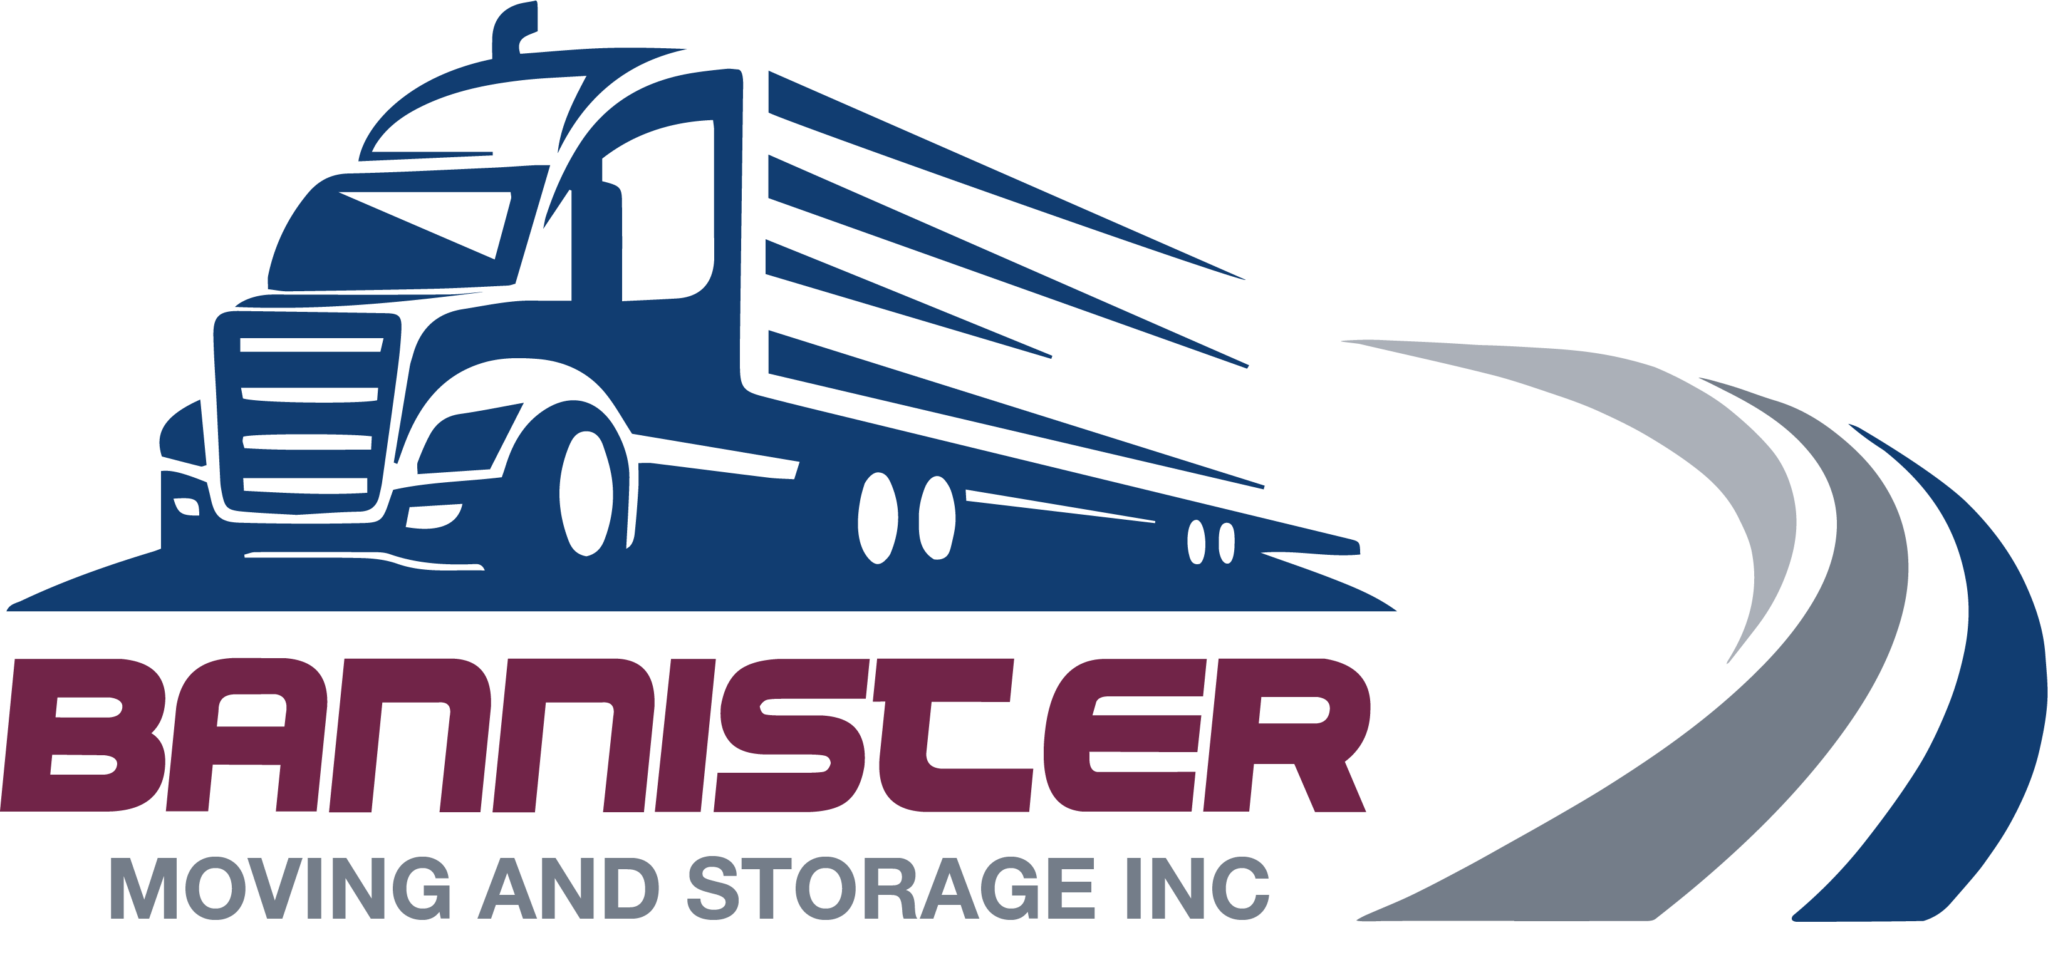 Bannister Moving & Storage, Inc. Logo